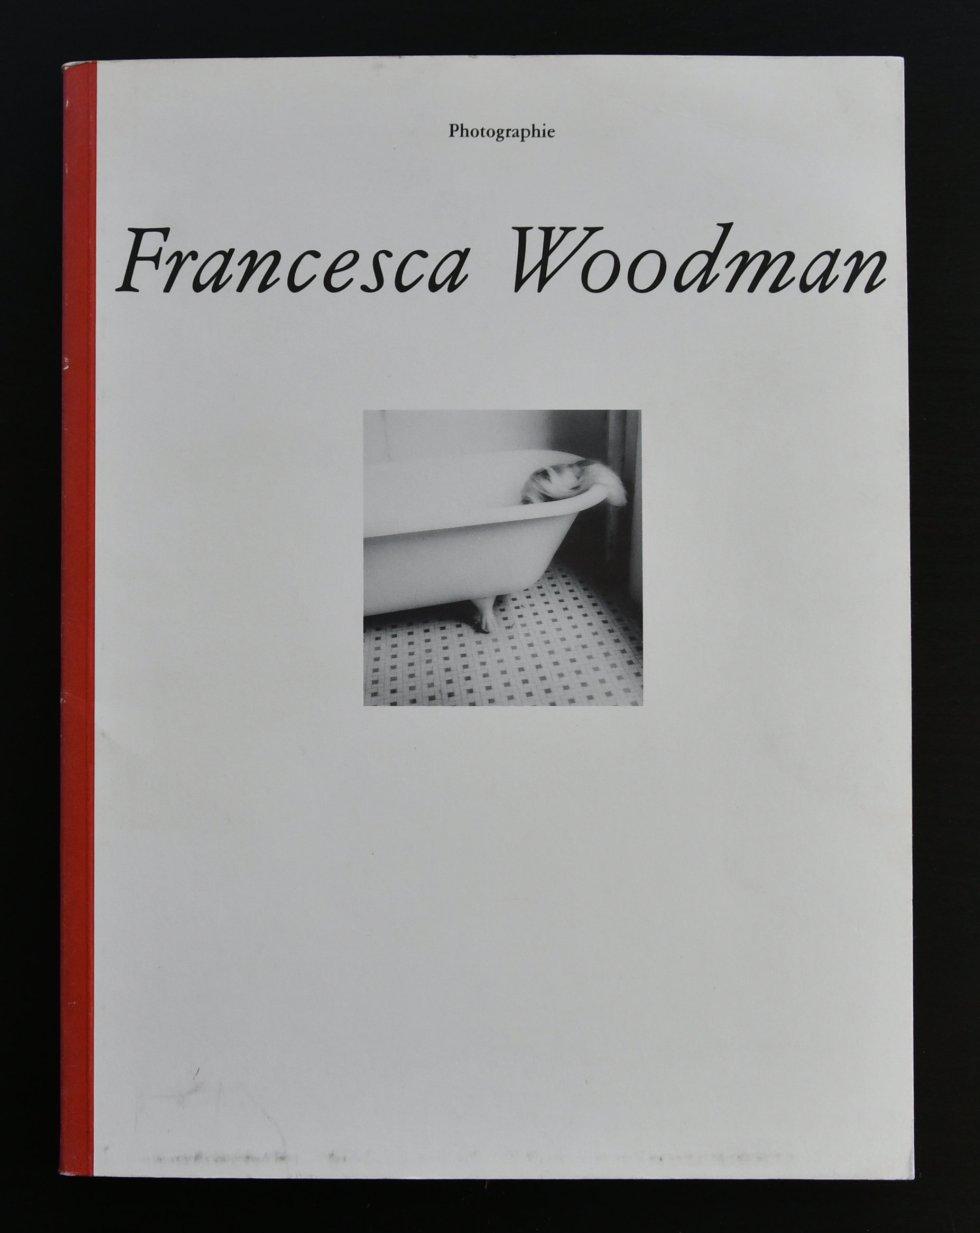 woodman francesca